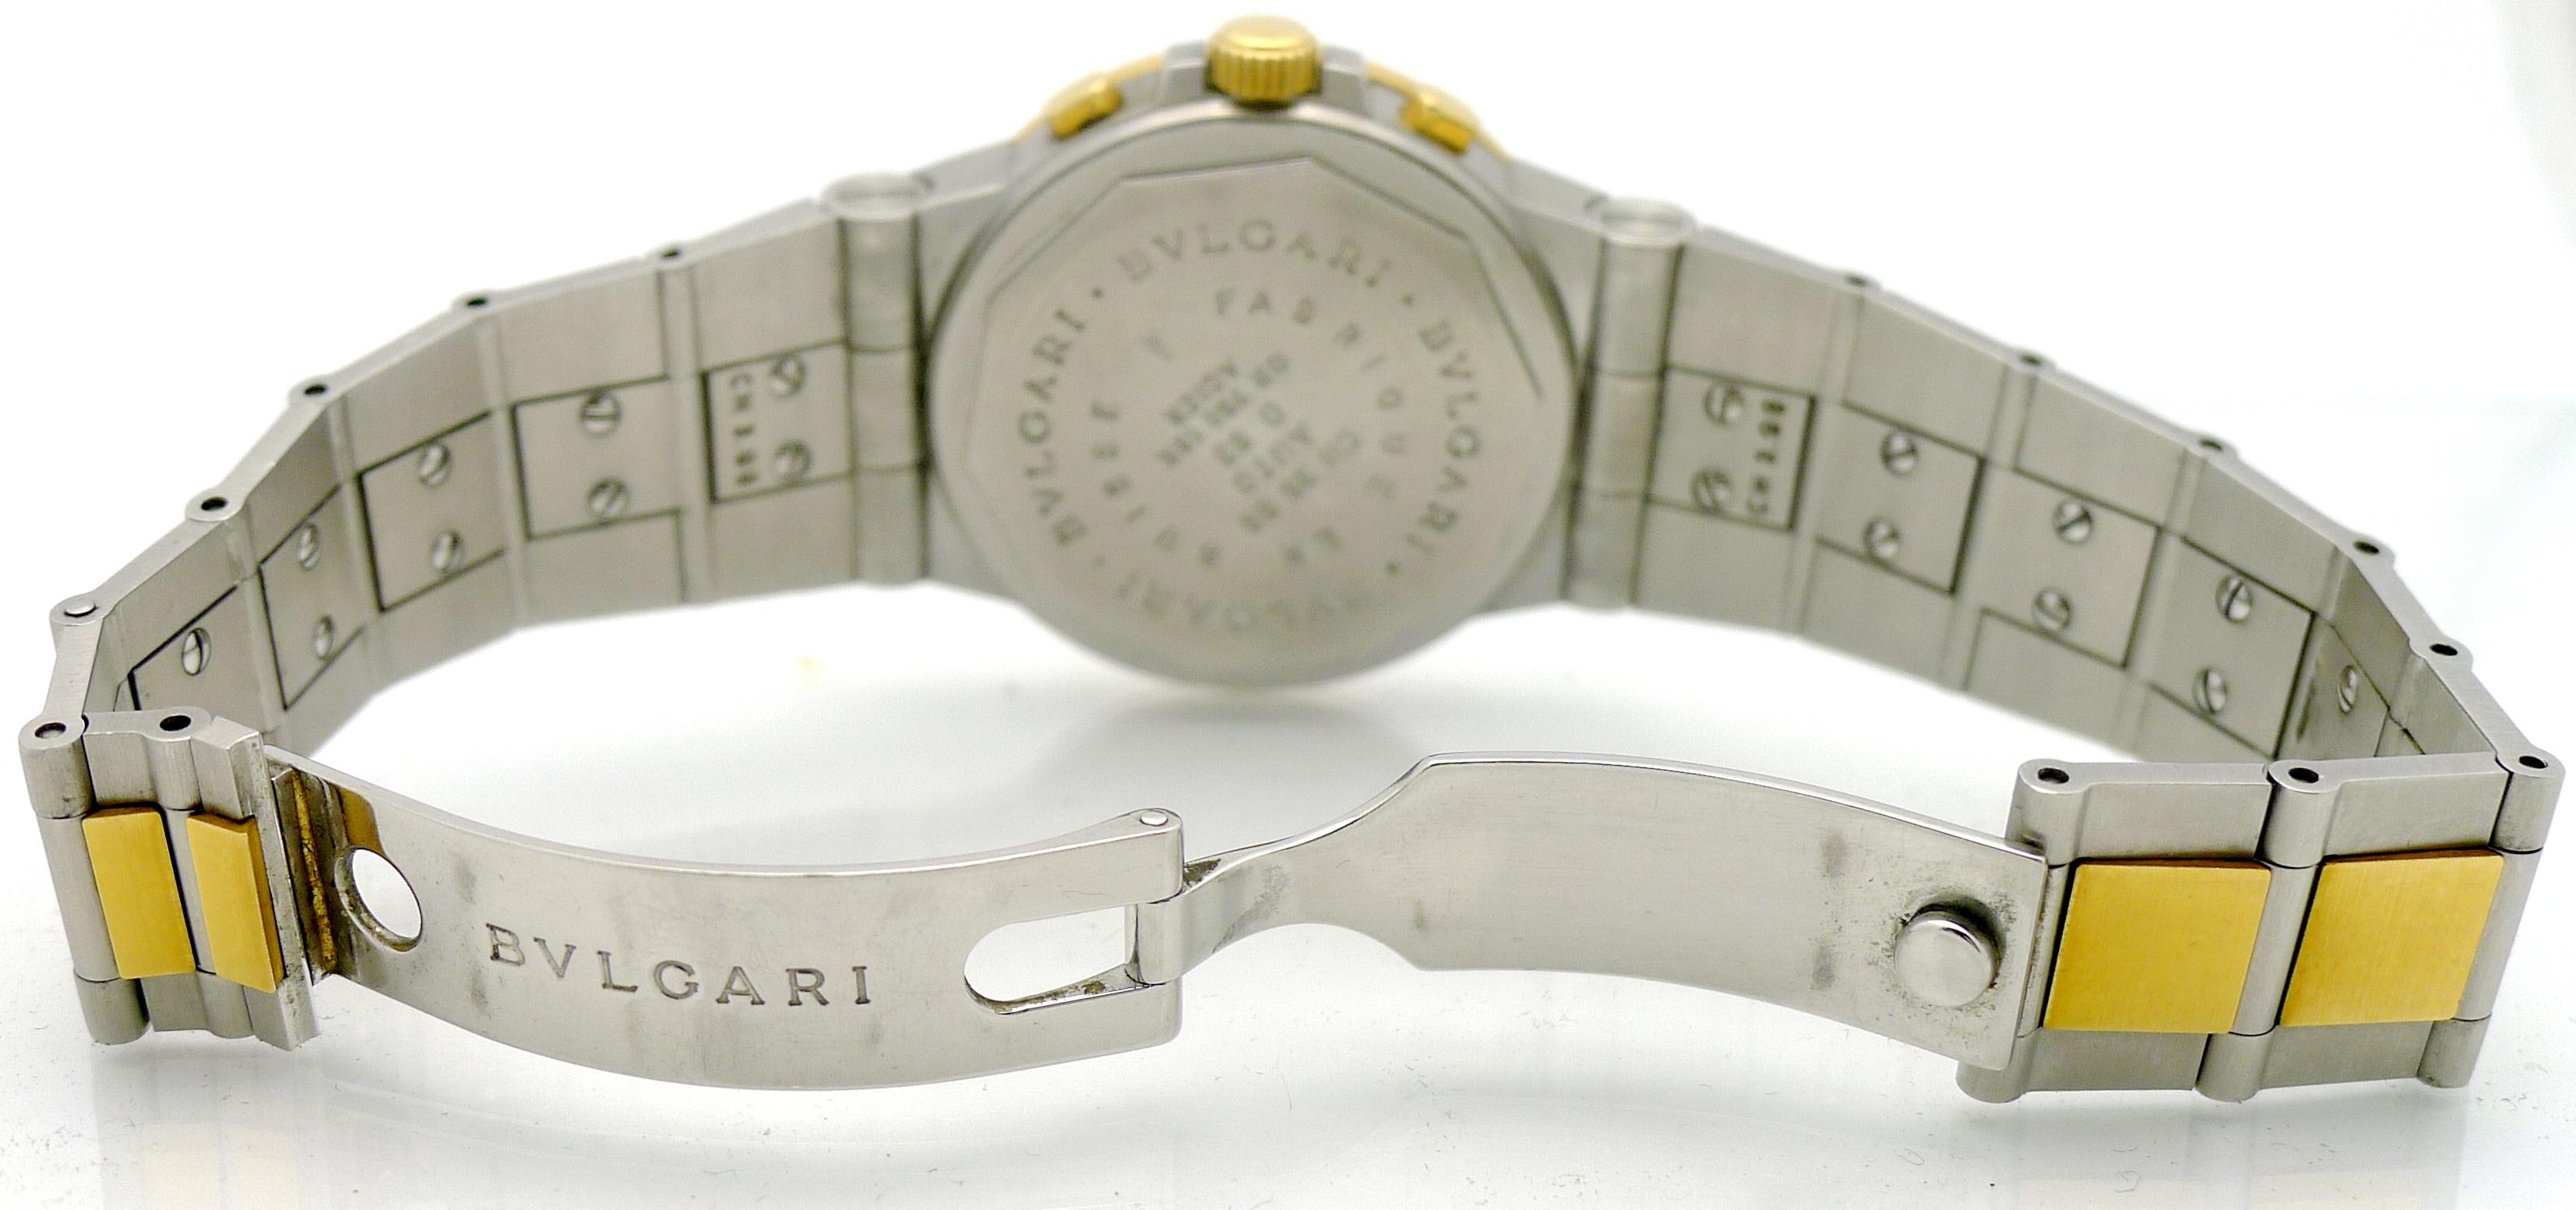 bulgari diagono stahl gold herren automatik chronograph ref ch 35 sg um 2000 ebay. Black Bedroom Furniture Sets. Home Design Ideas